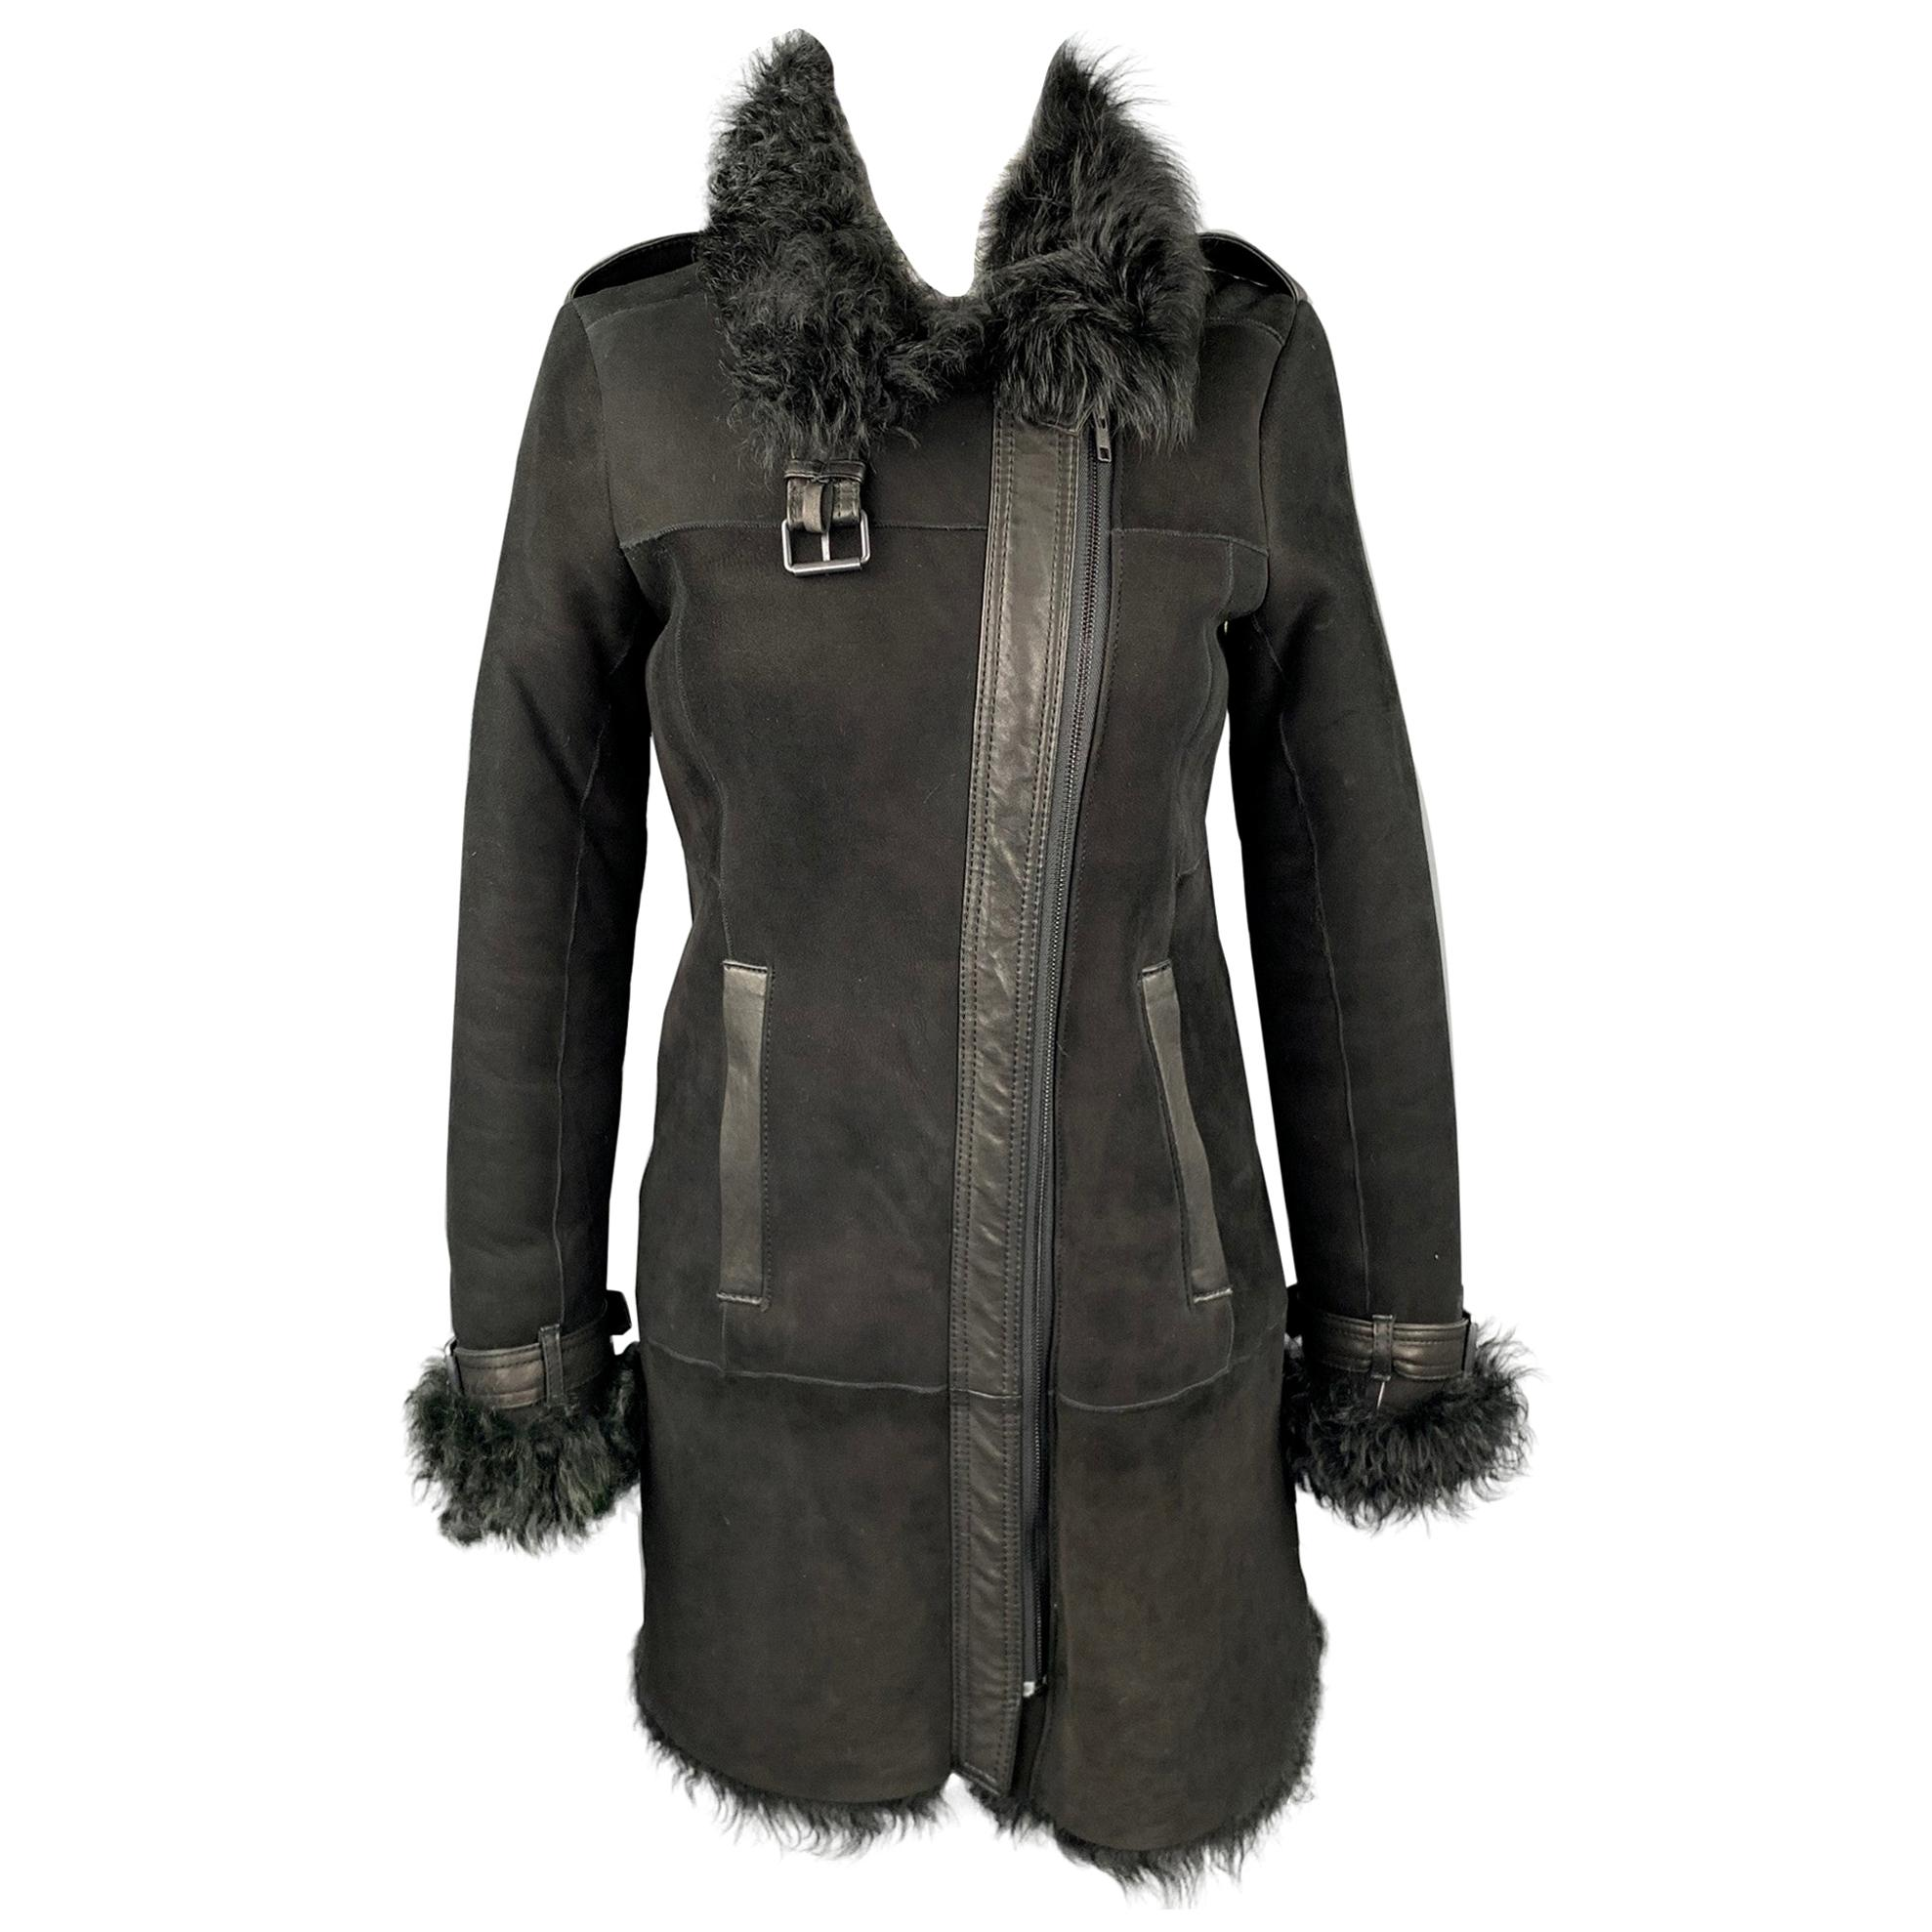 THEORY Size Petite Black Shearling Epaulettes Zip Up Coat